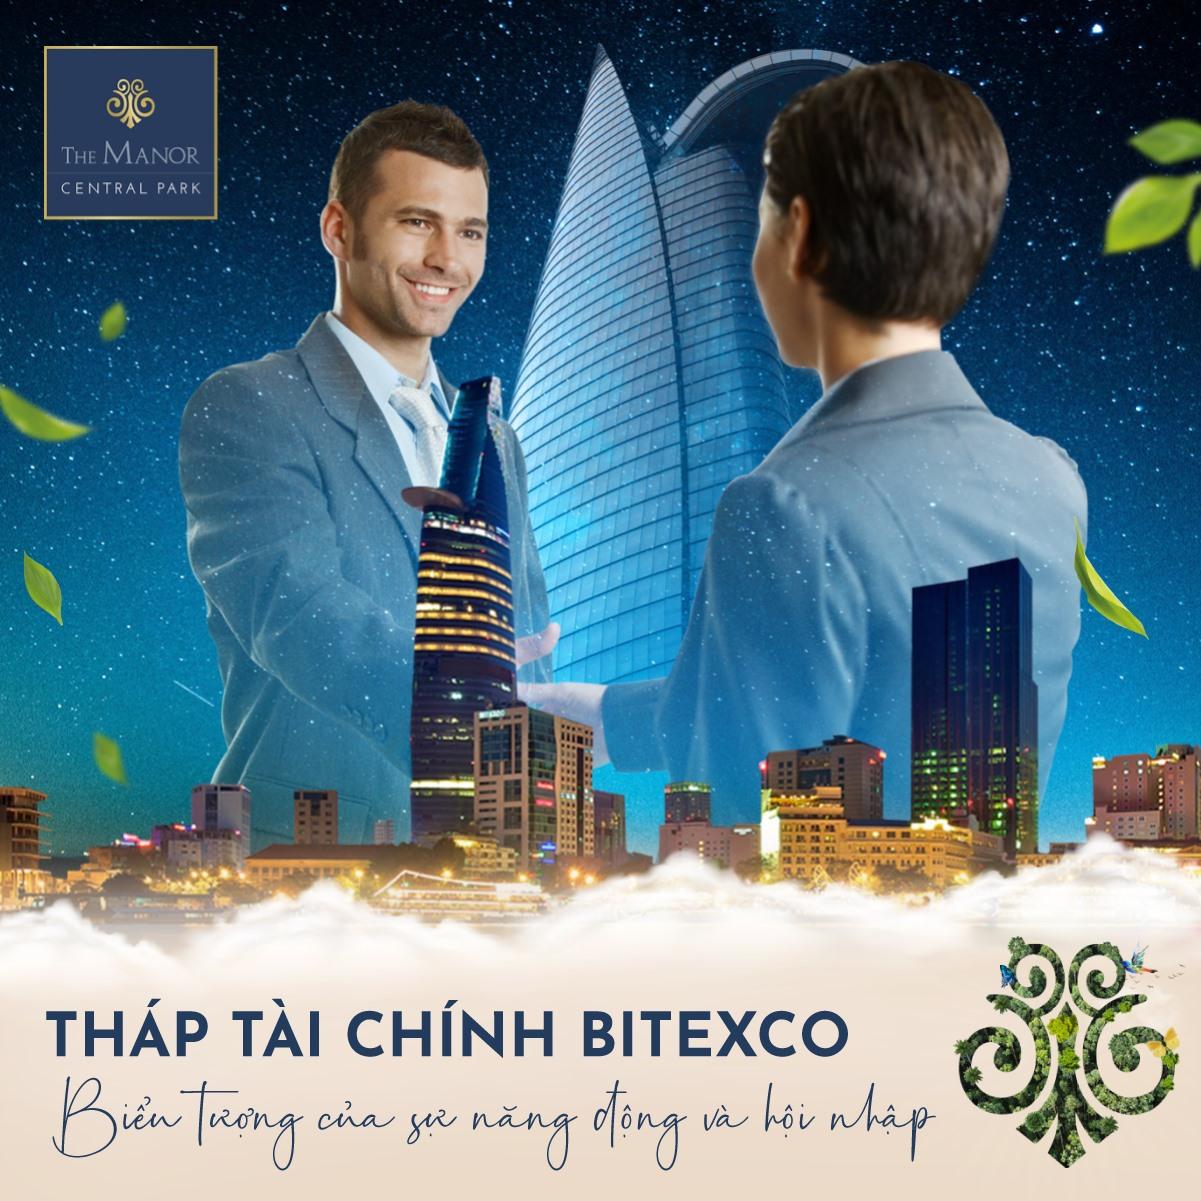 Thap tai chinh BITEXCO FINANCIAL TOWER - Trang chủ